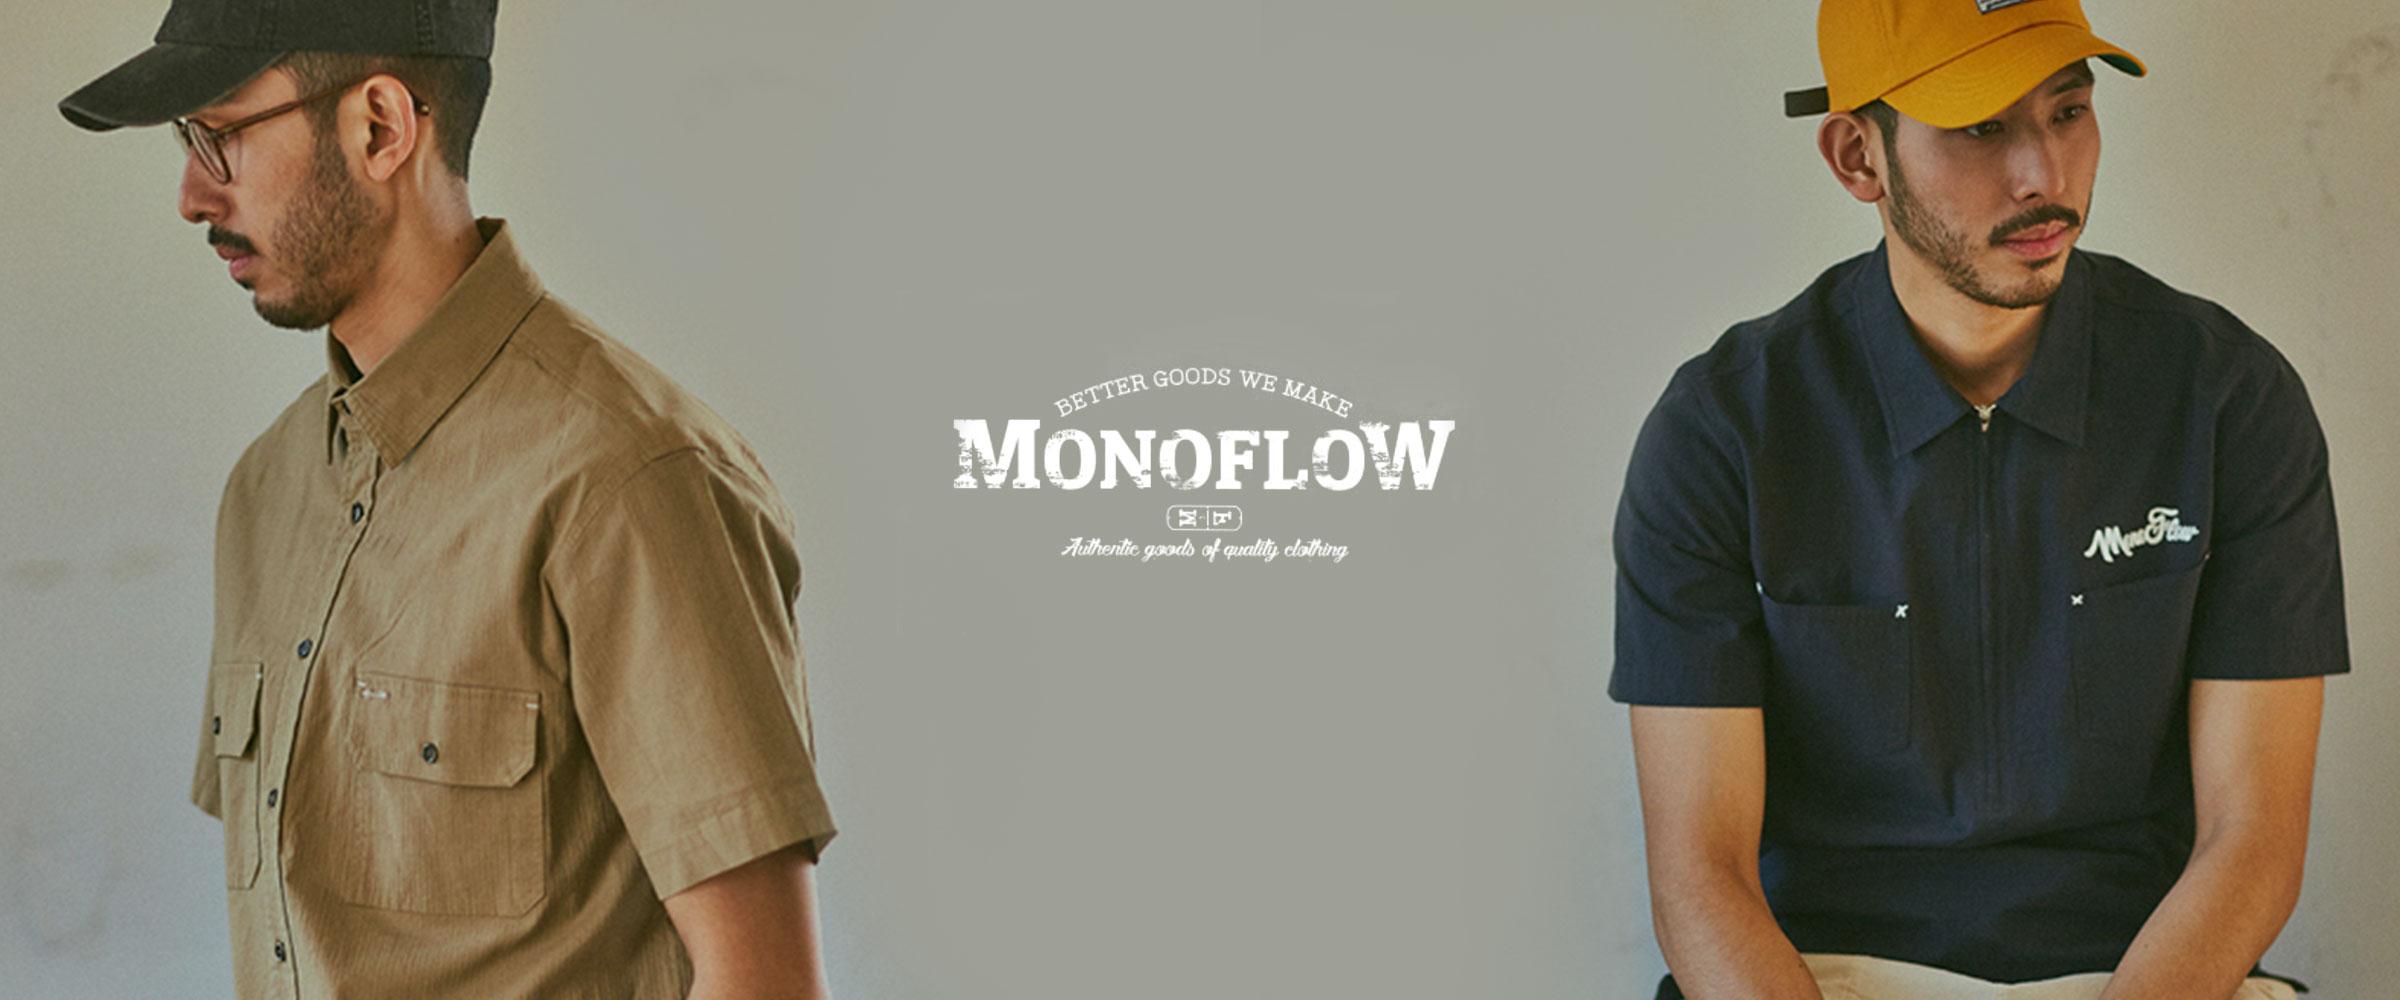 monoflow.jpg